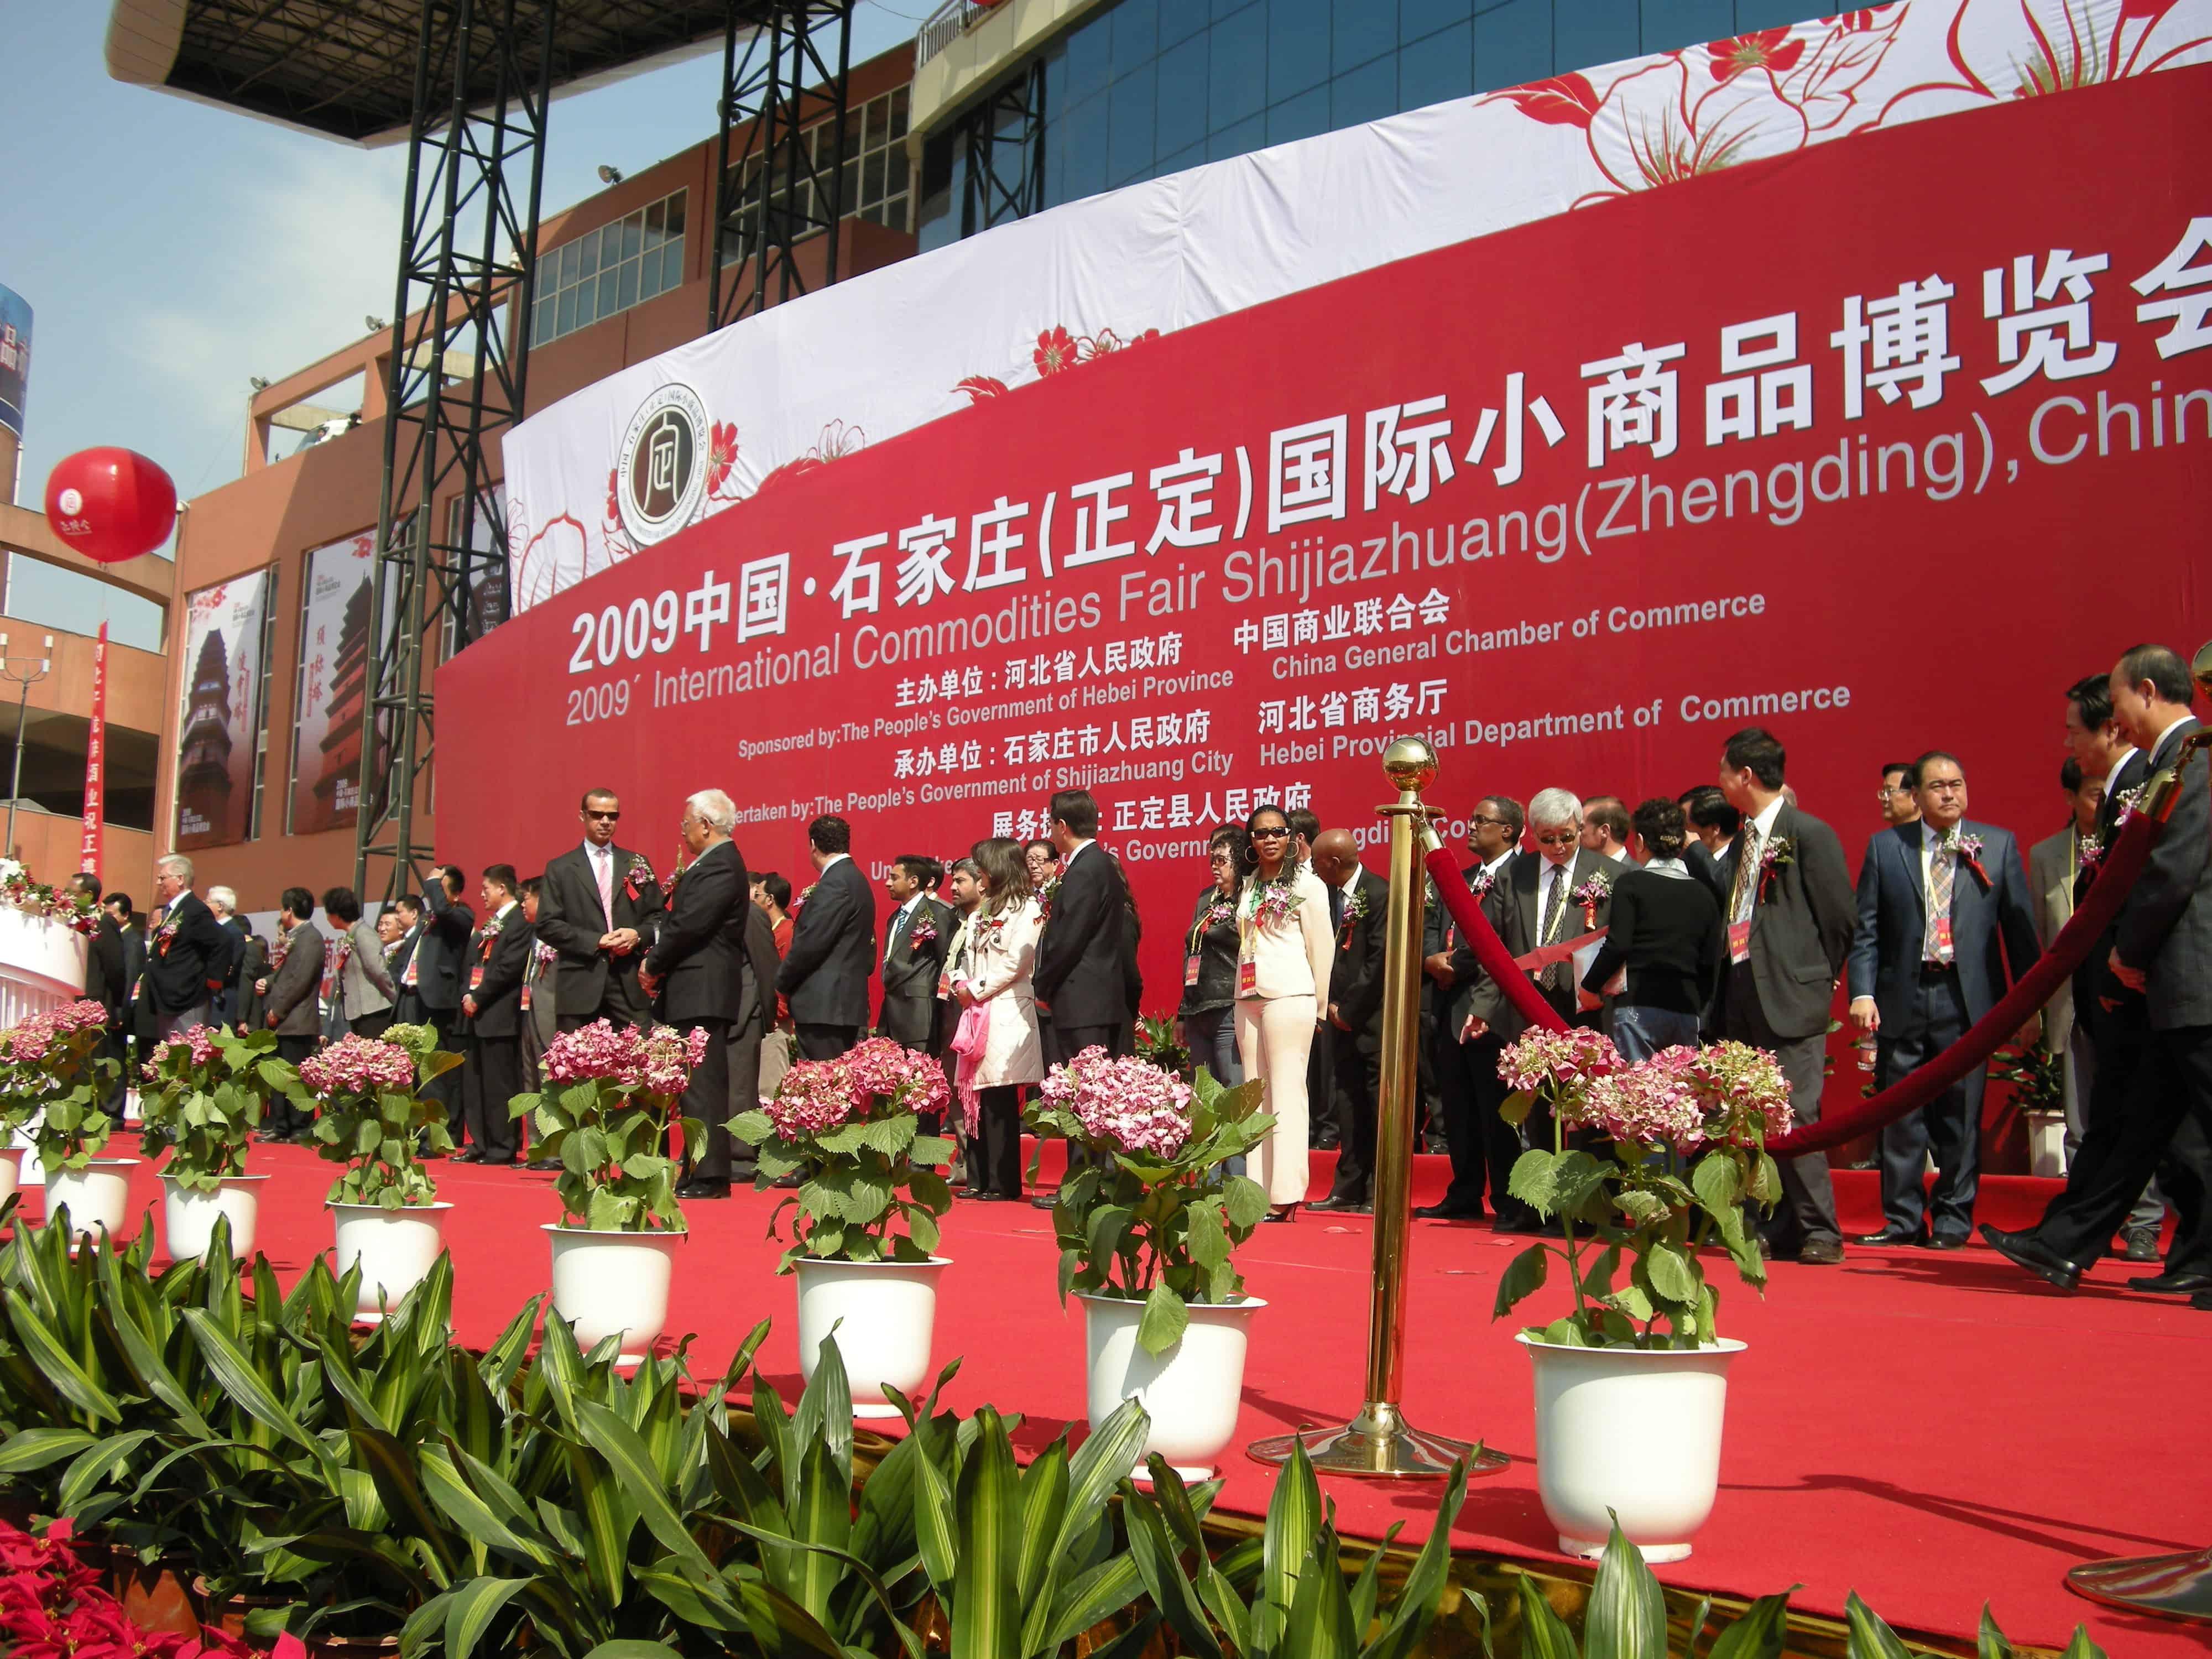 SCCC´s kontakt resor besökte Shijiazhuang Zhengding international commondities fair april 2009